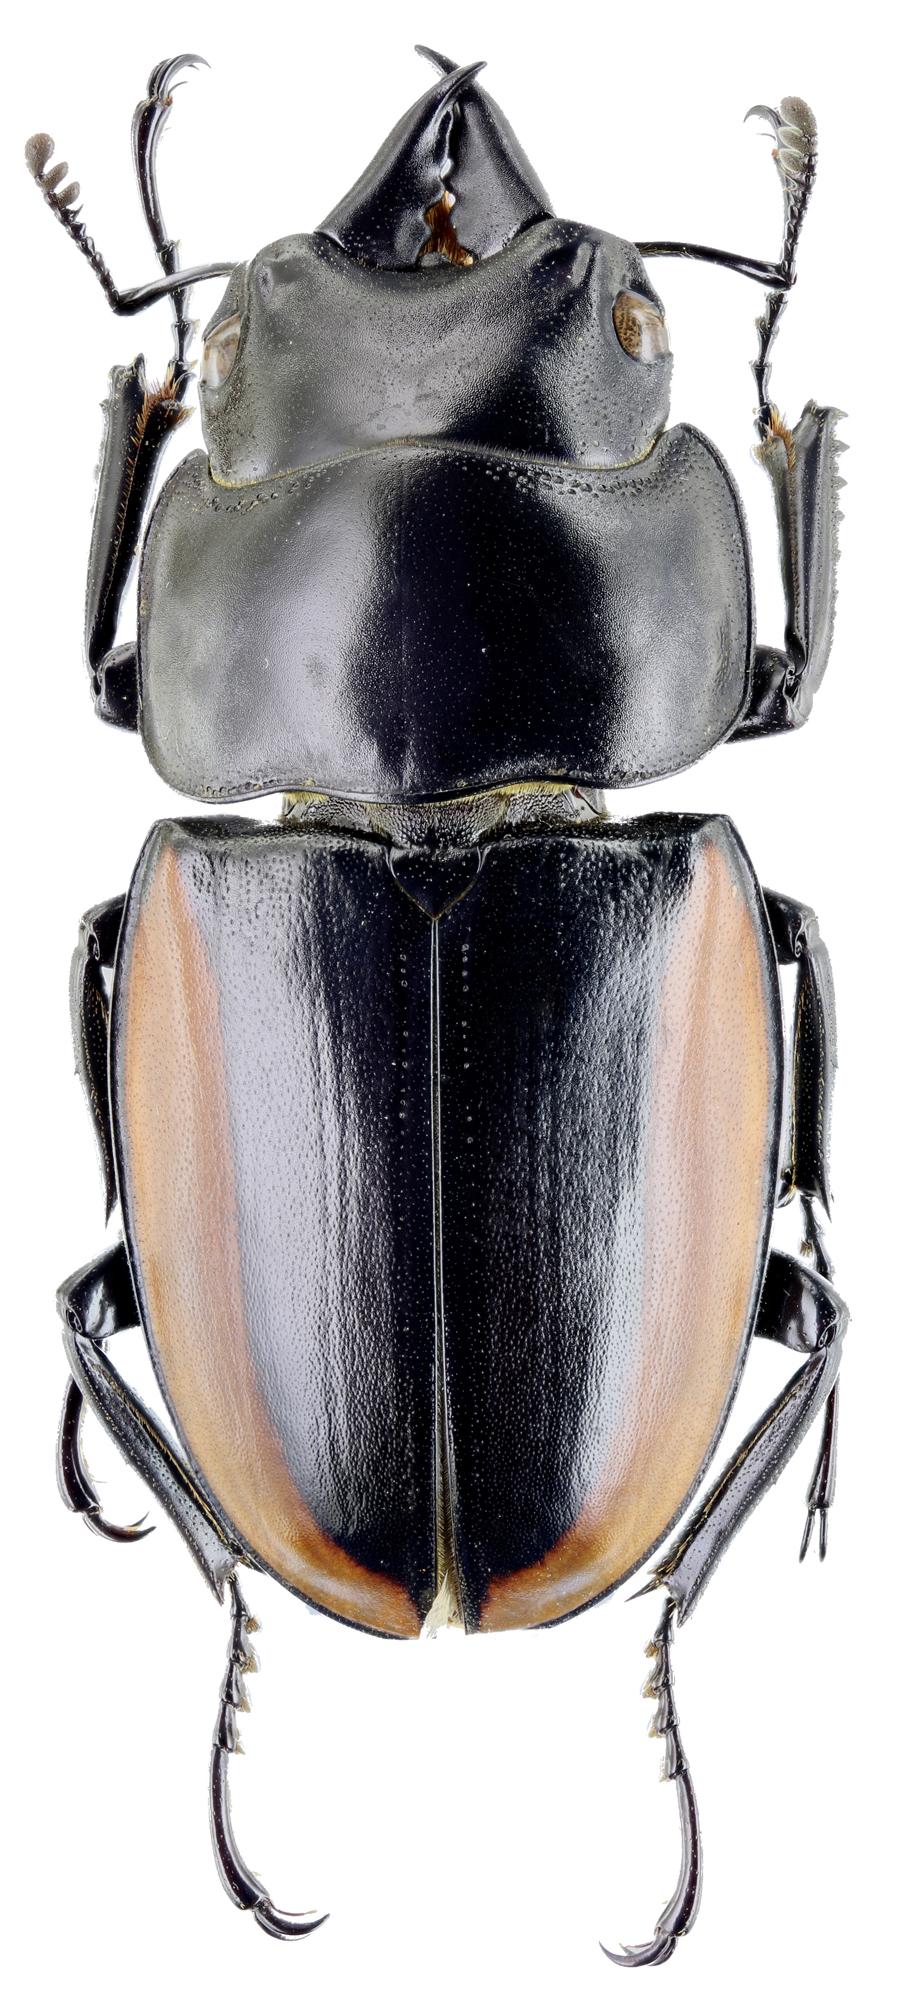 Prosopocoilus lafertei moineri 30706zs14.jpg